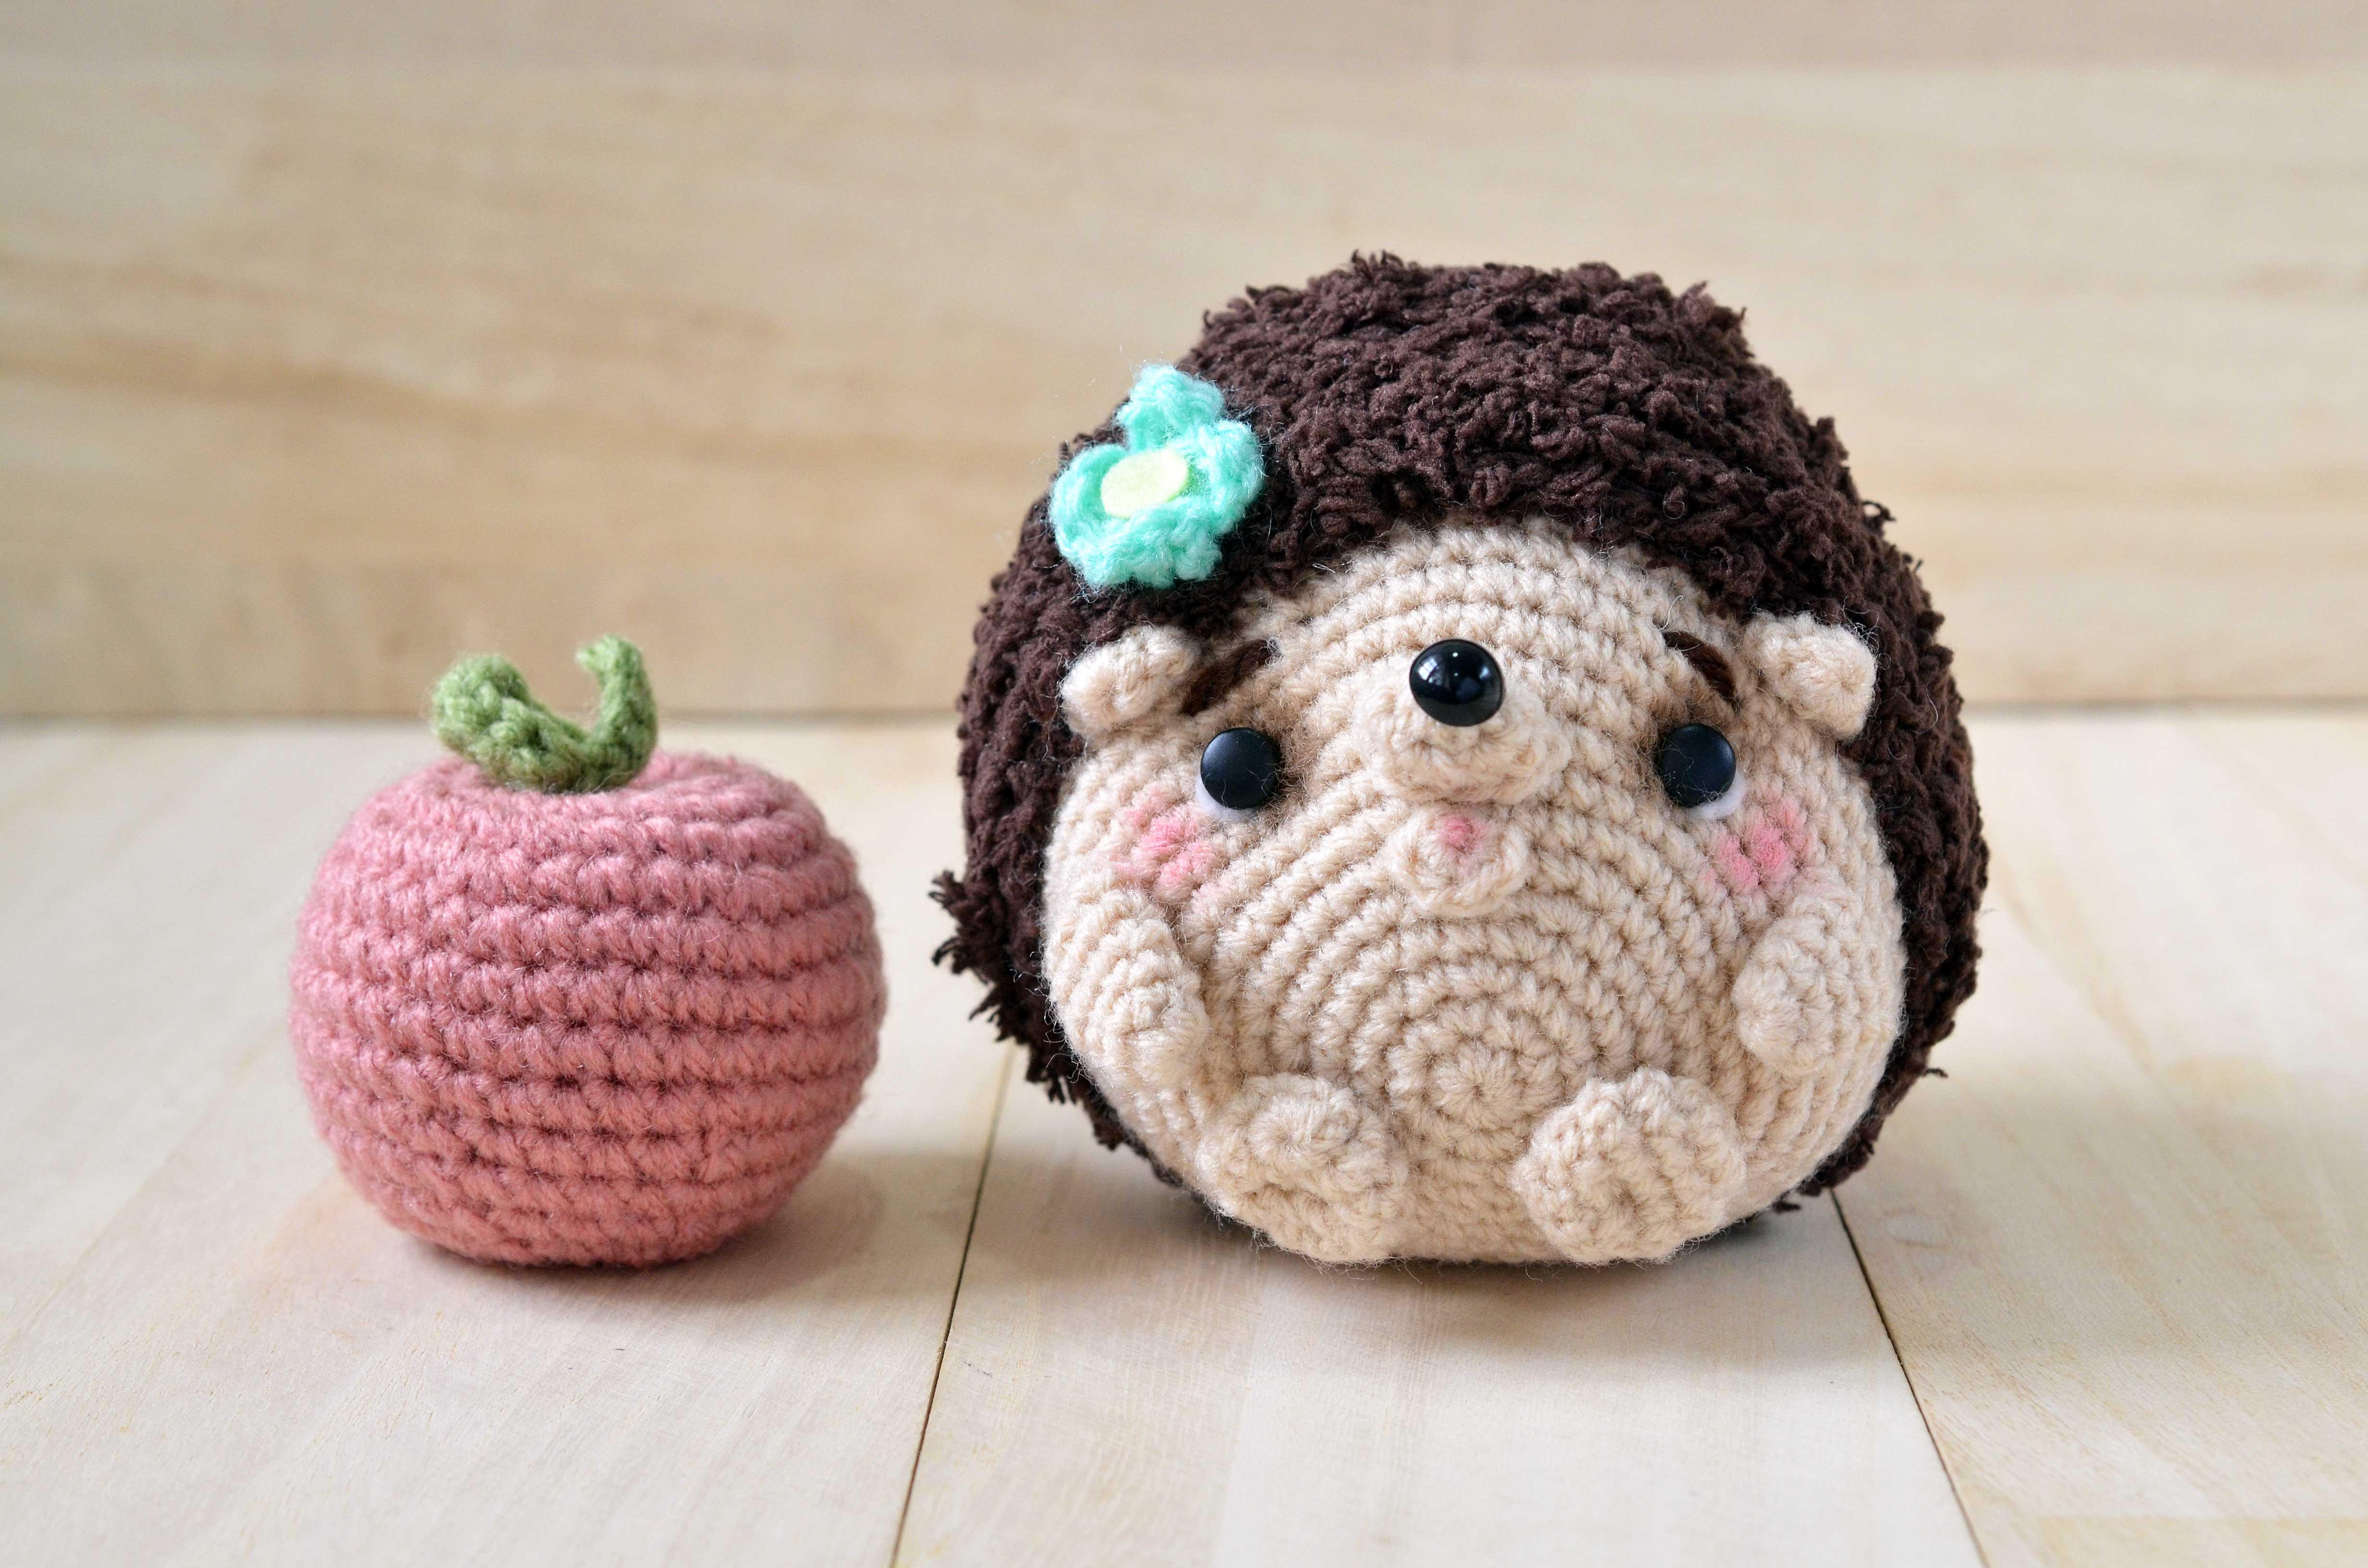 New amigurumi pattern: Mimi-chan the hedgehog | amiguruMEI ...